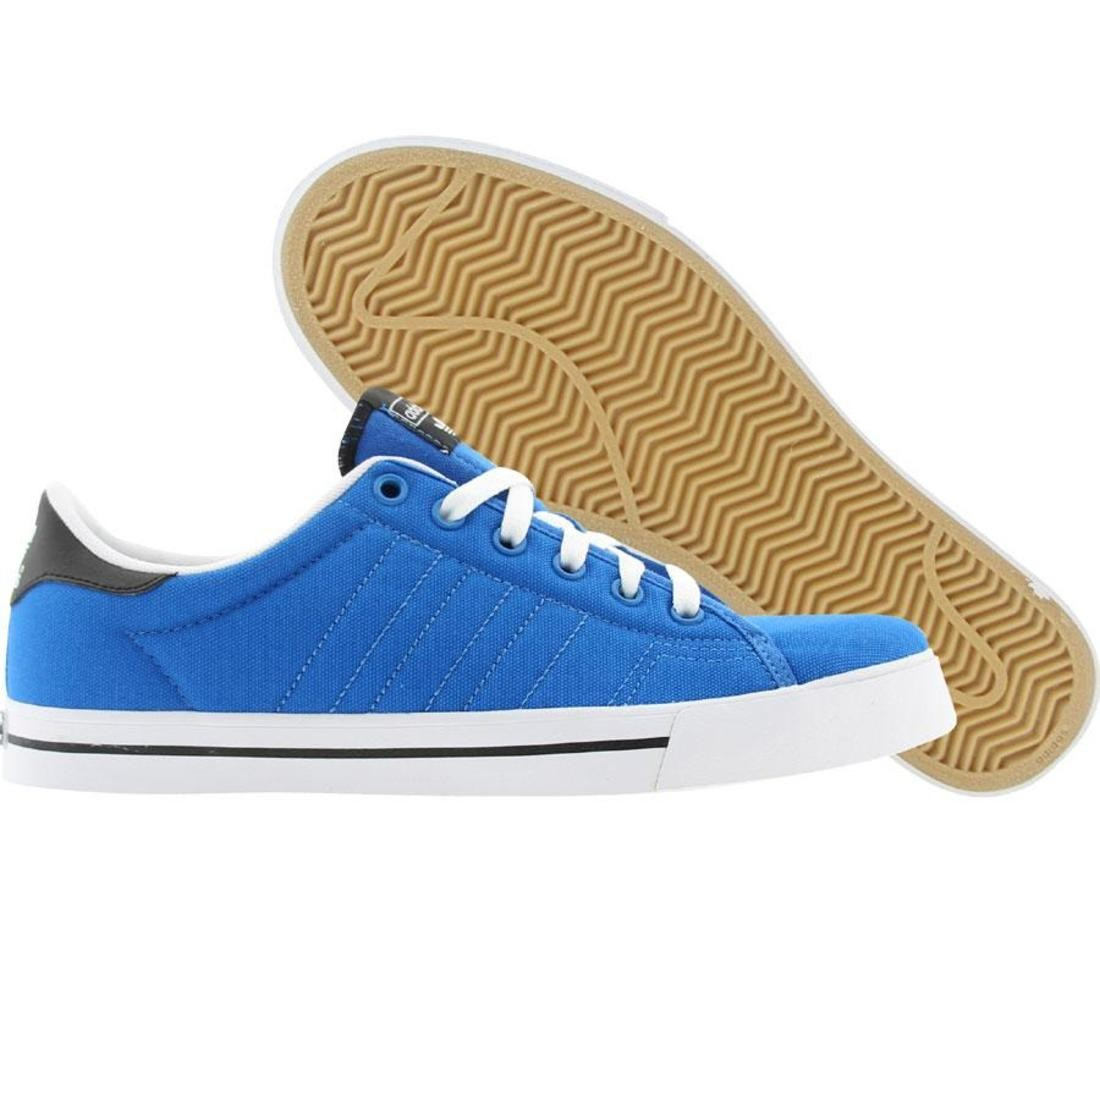 Adidas Skate Men AdiCourt AS (bluebird / black / runninwhite)